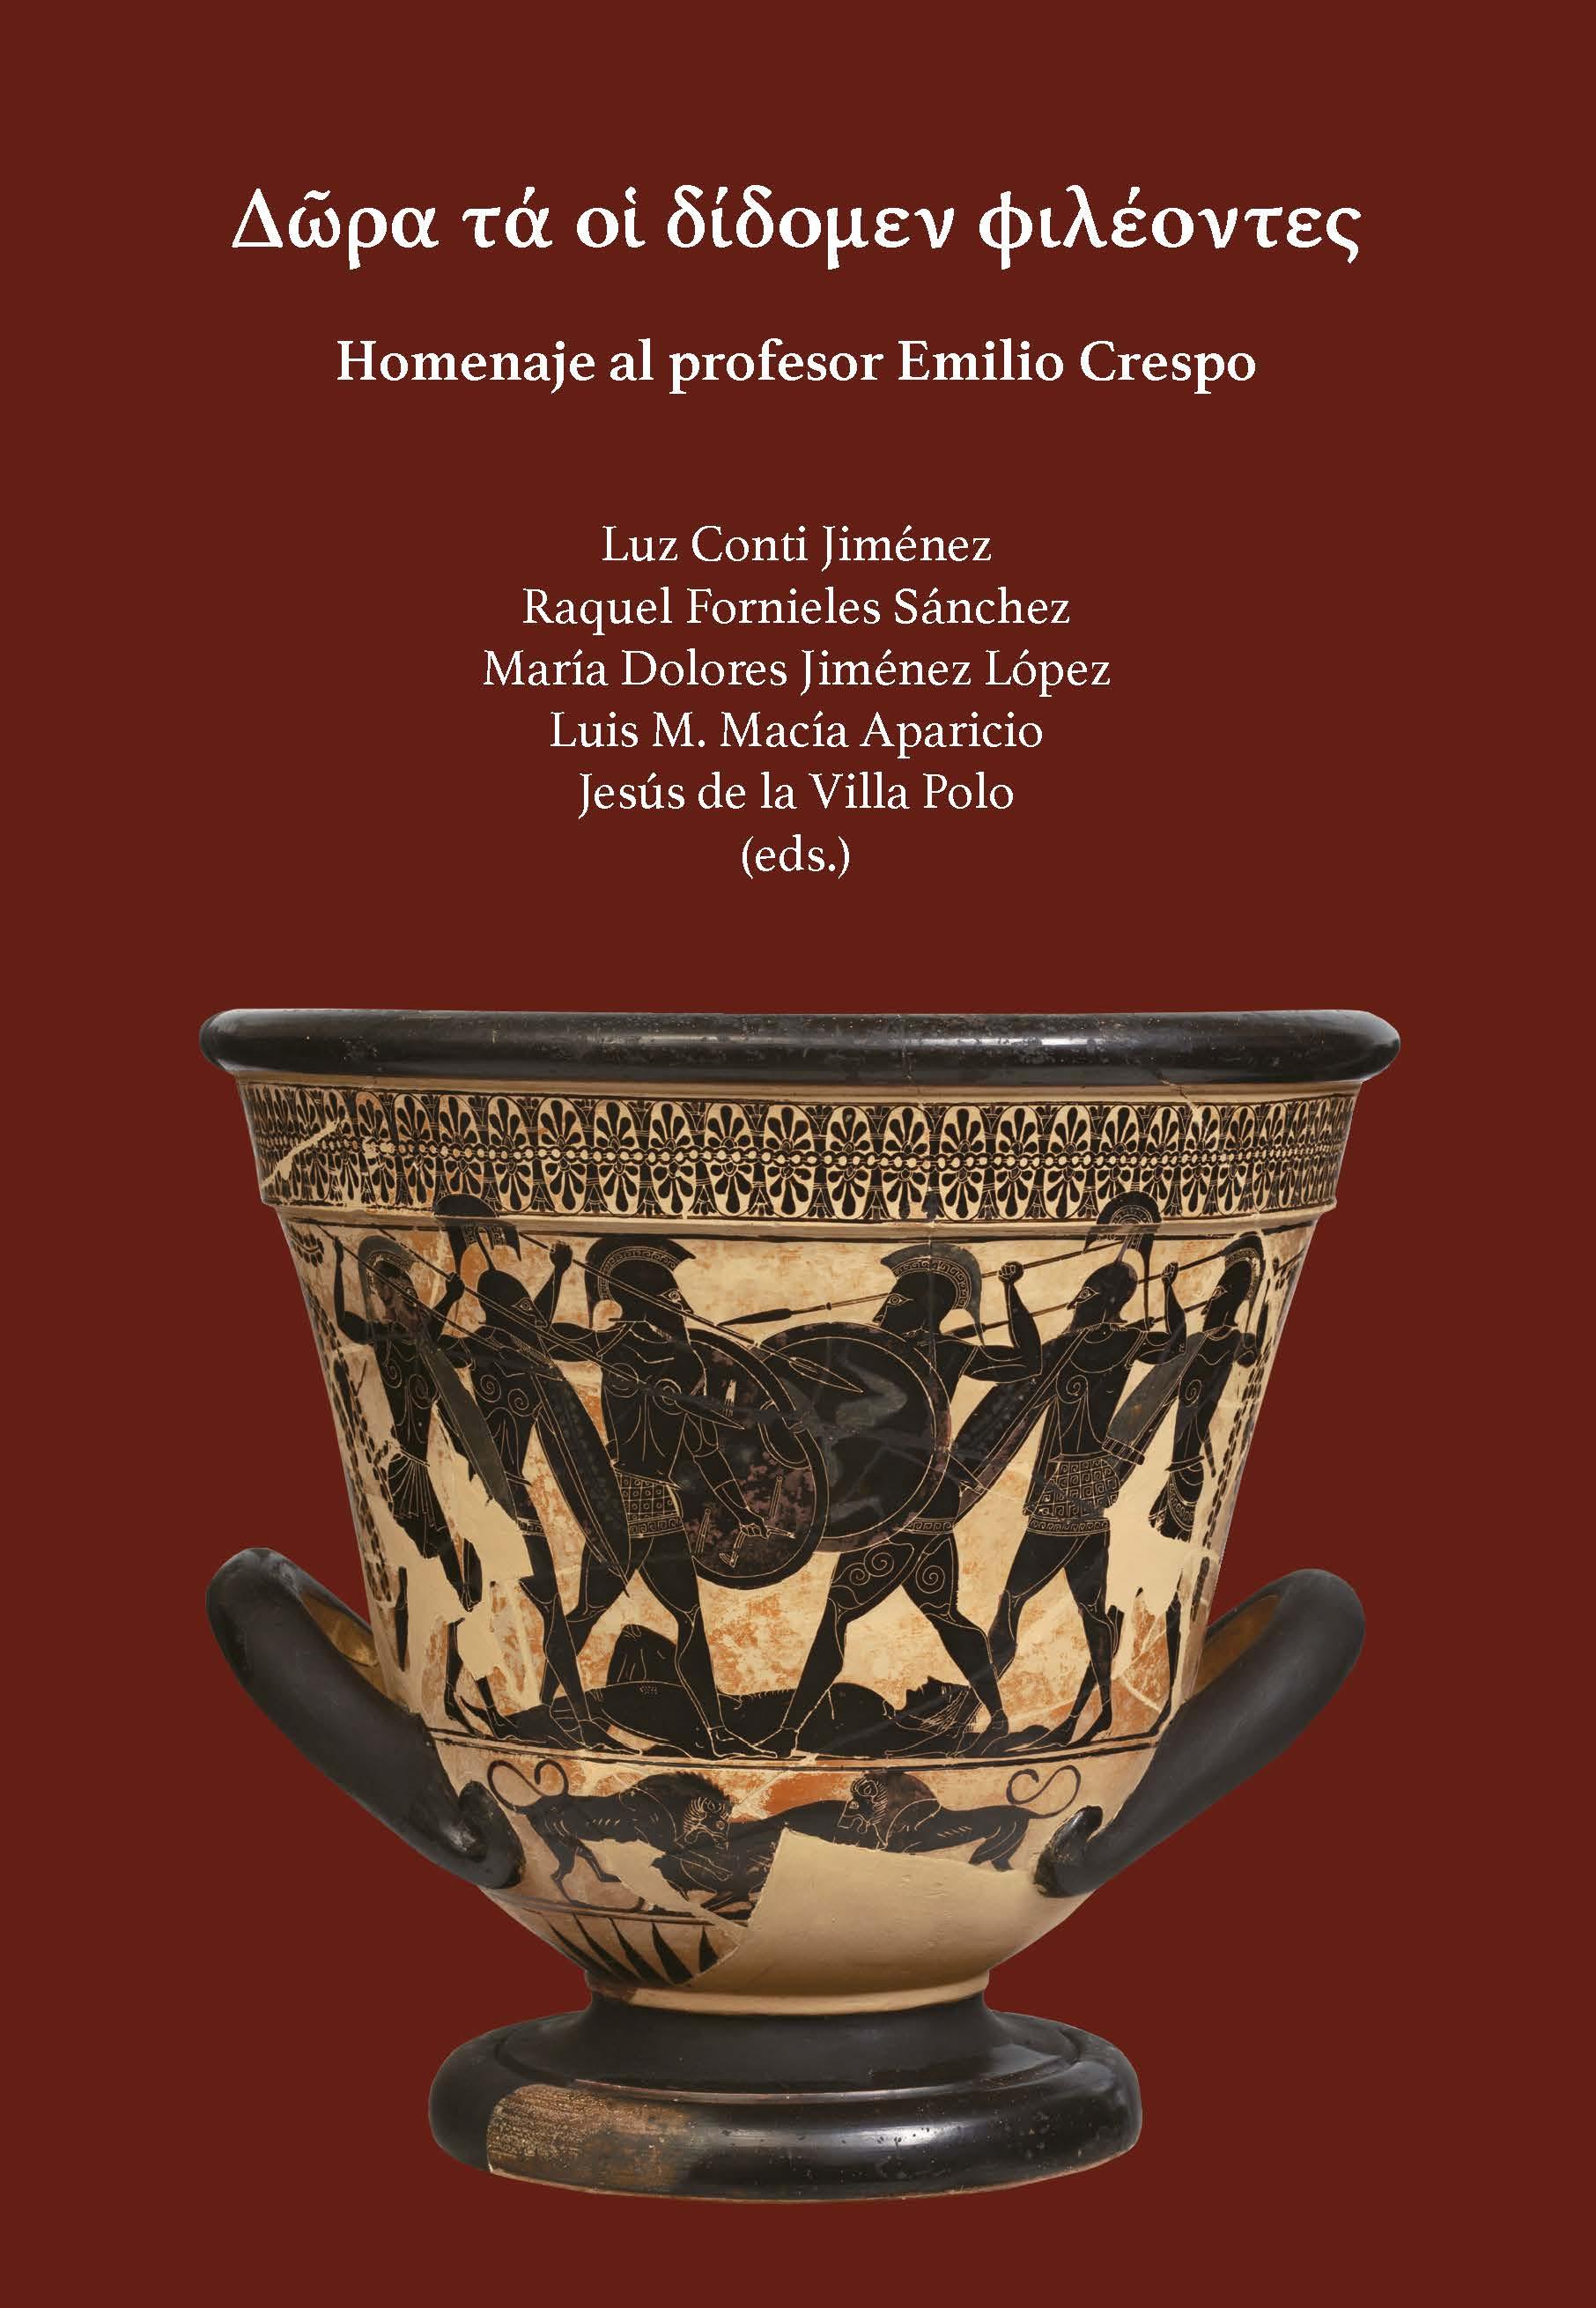 Portada del libro Homenaje al profesor Emilio Crespo